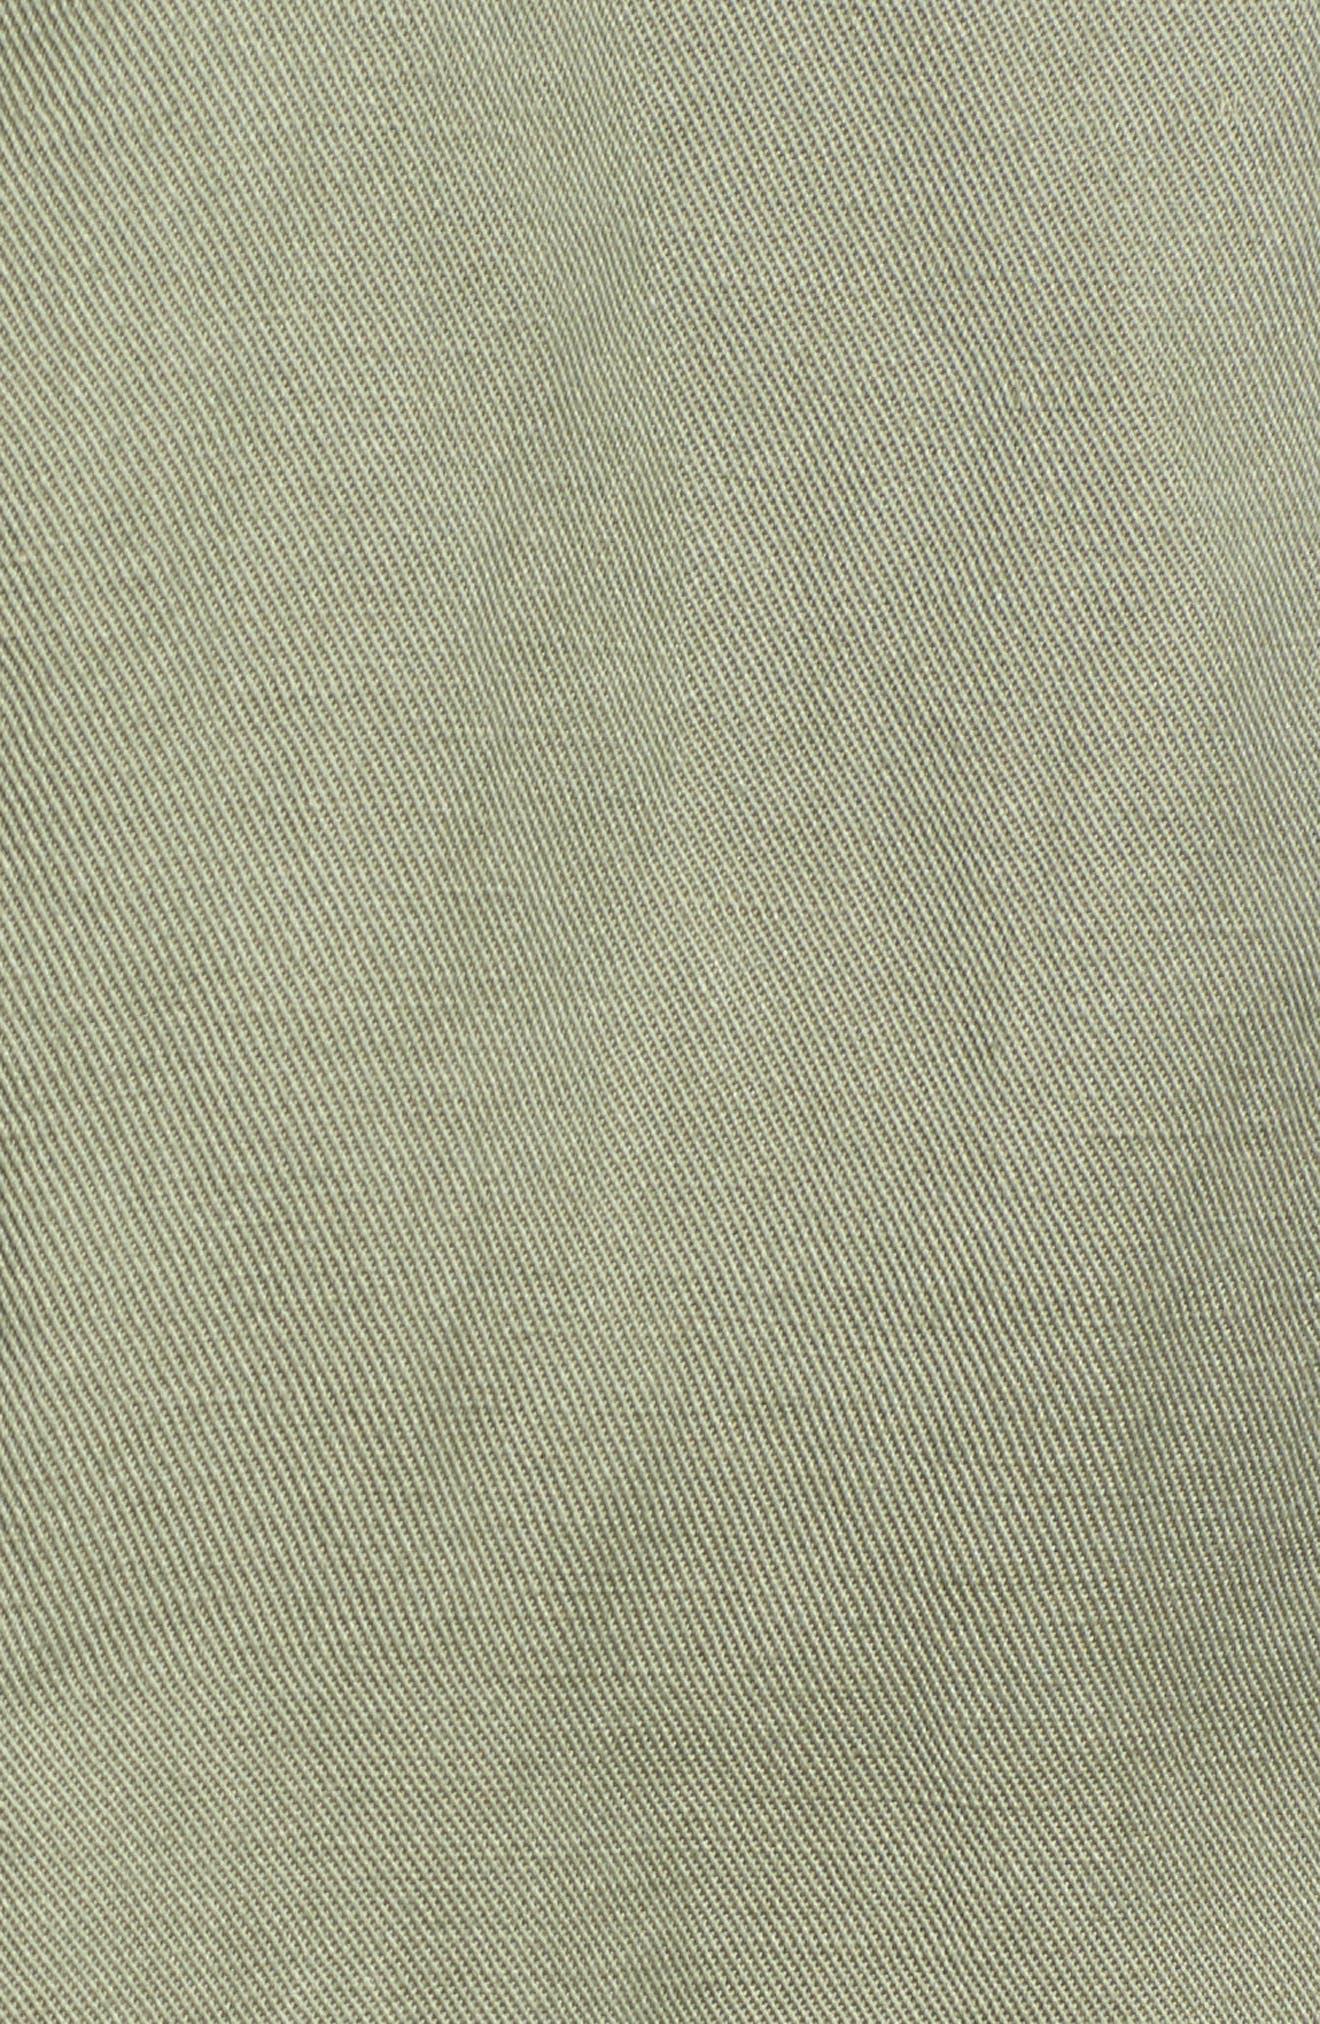 Hendrick Jacket,                             Alternate thumbnail 6, color,                             Sage